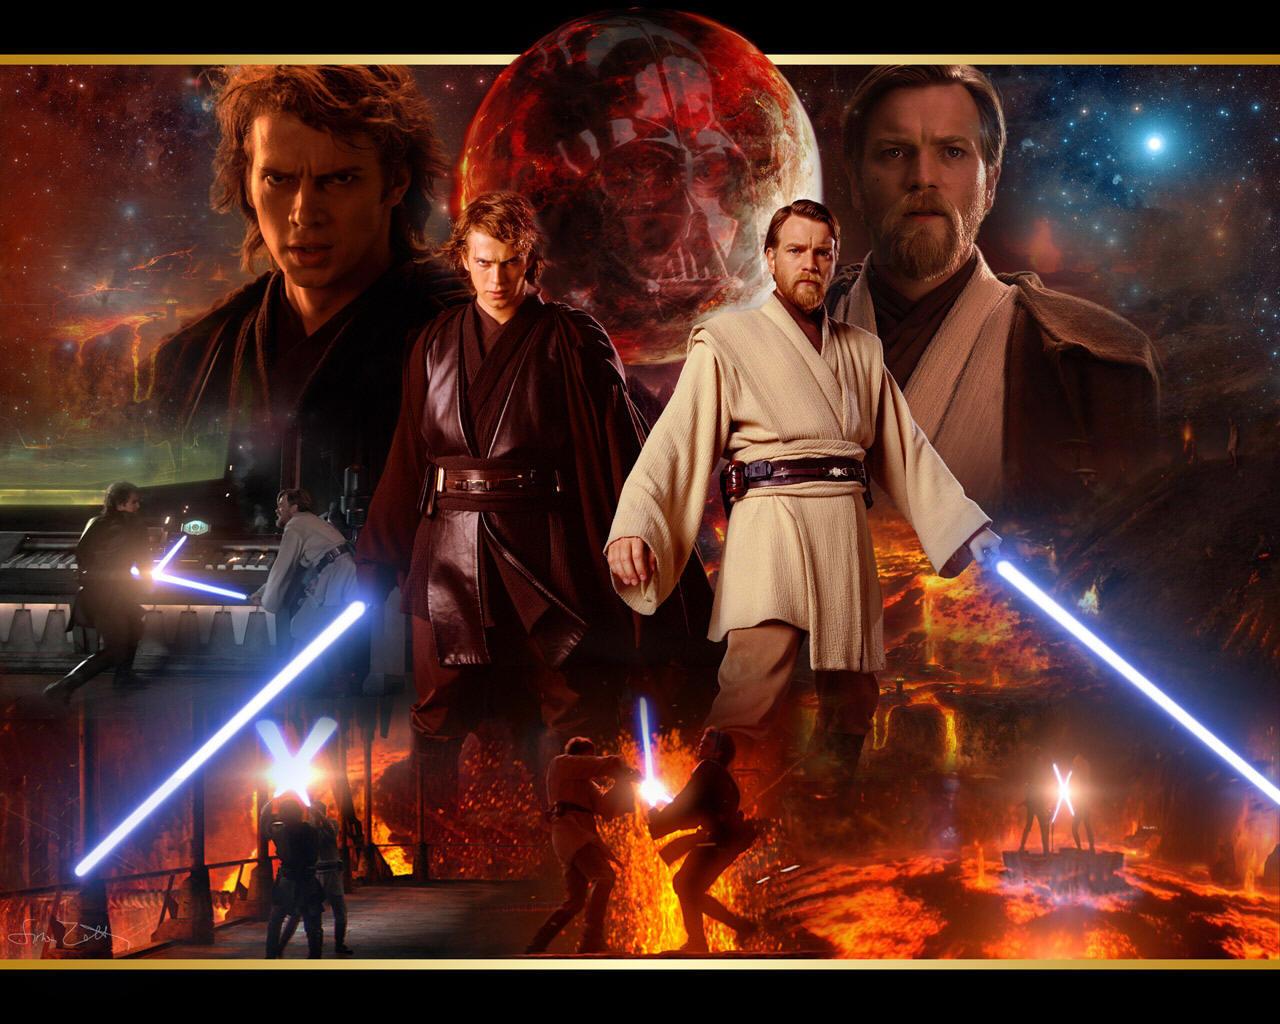 Star Wars Revenge of the Sith 1280x1024